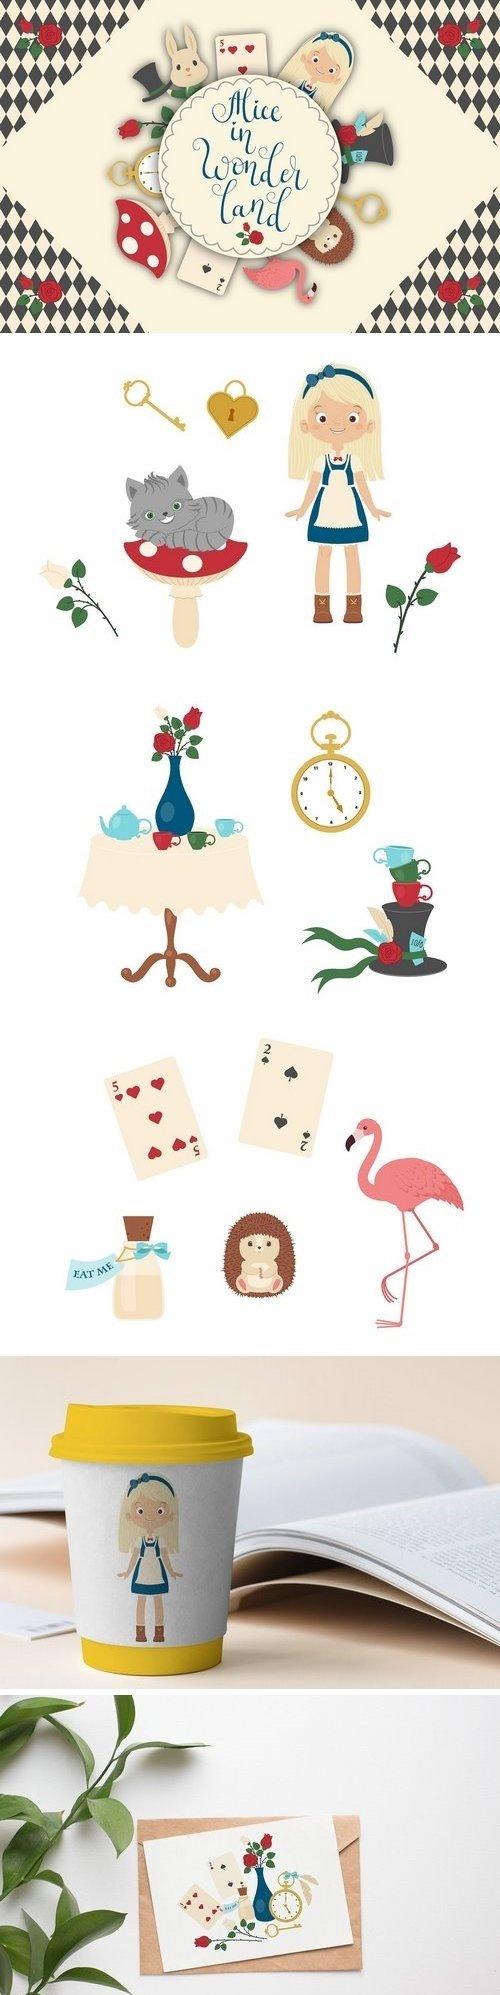 CM - Alice in Wonderland Vector Set 2724847